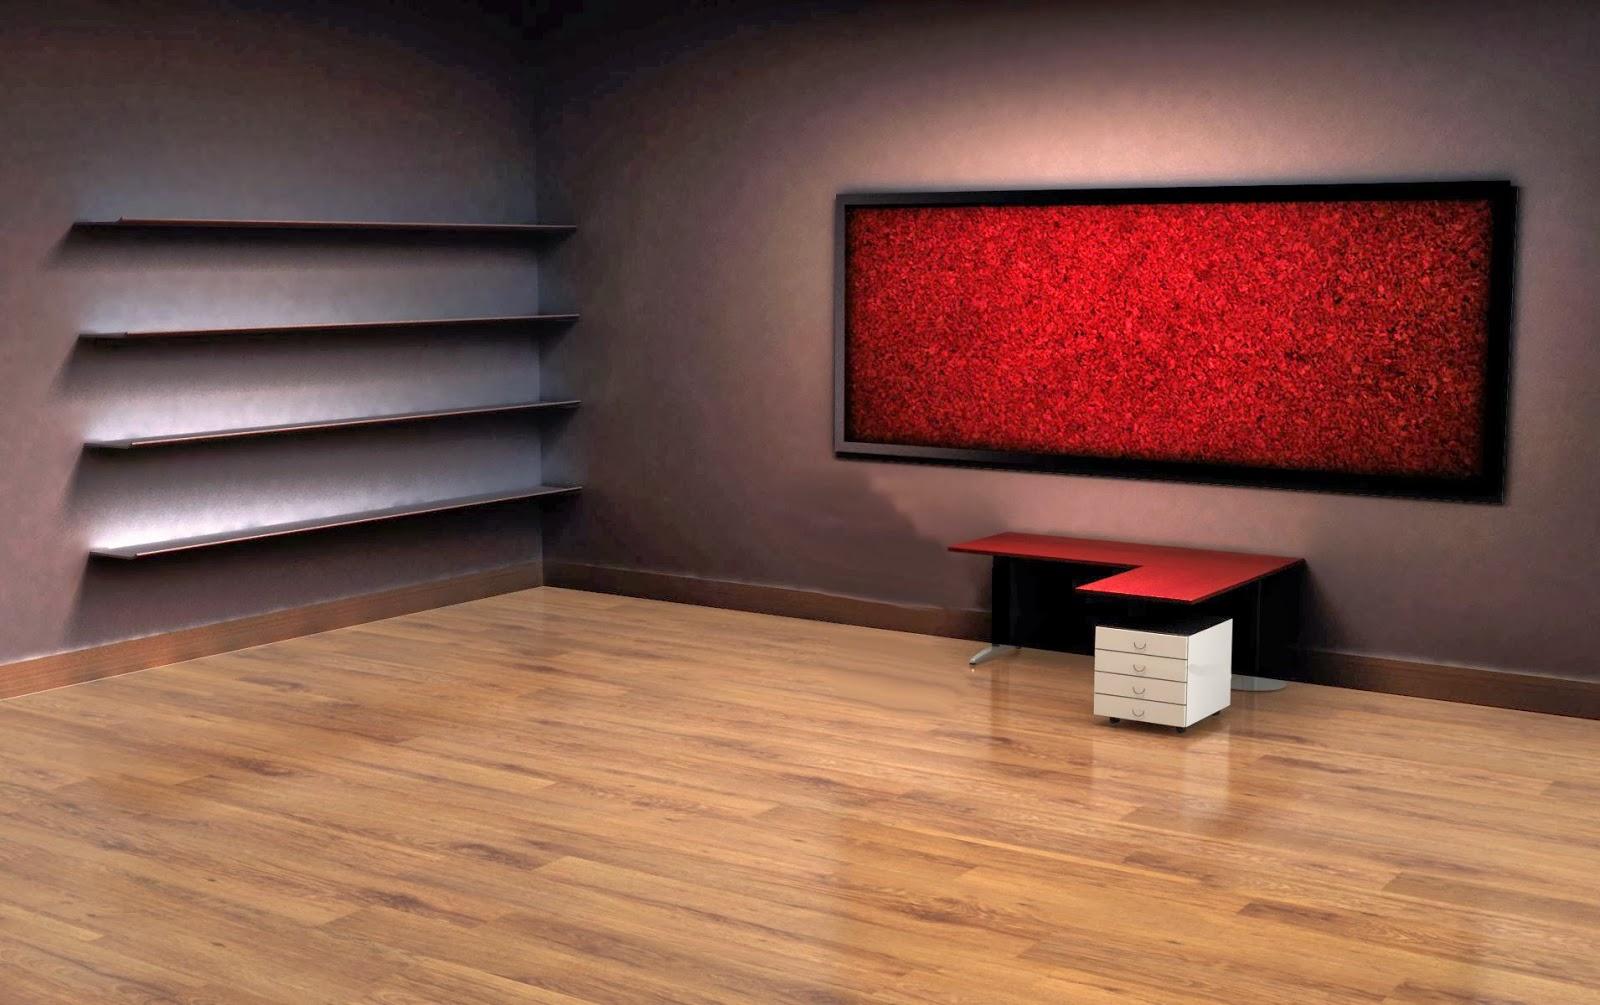 Nn 3d Wallpaper خلفيات على شكل غرفة الاحتراف